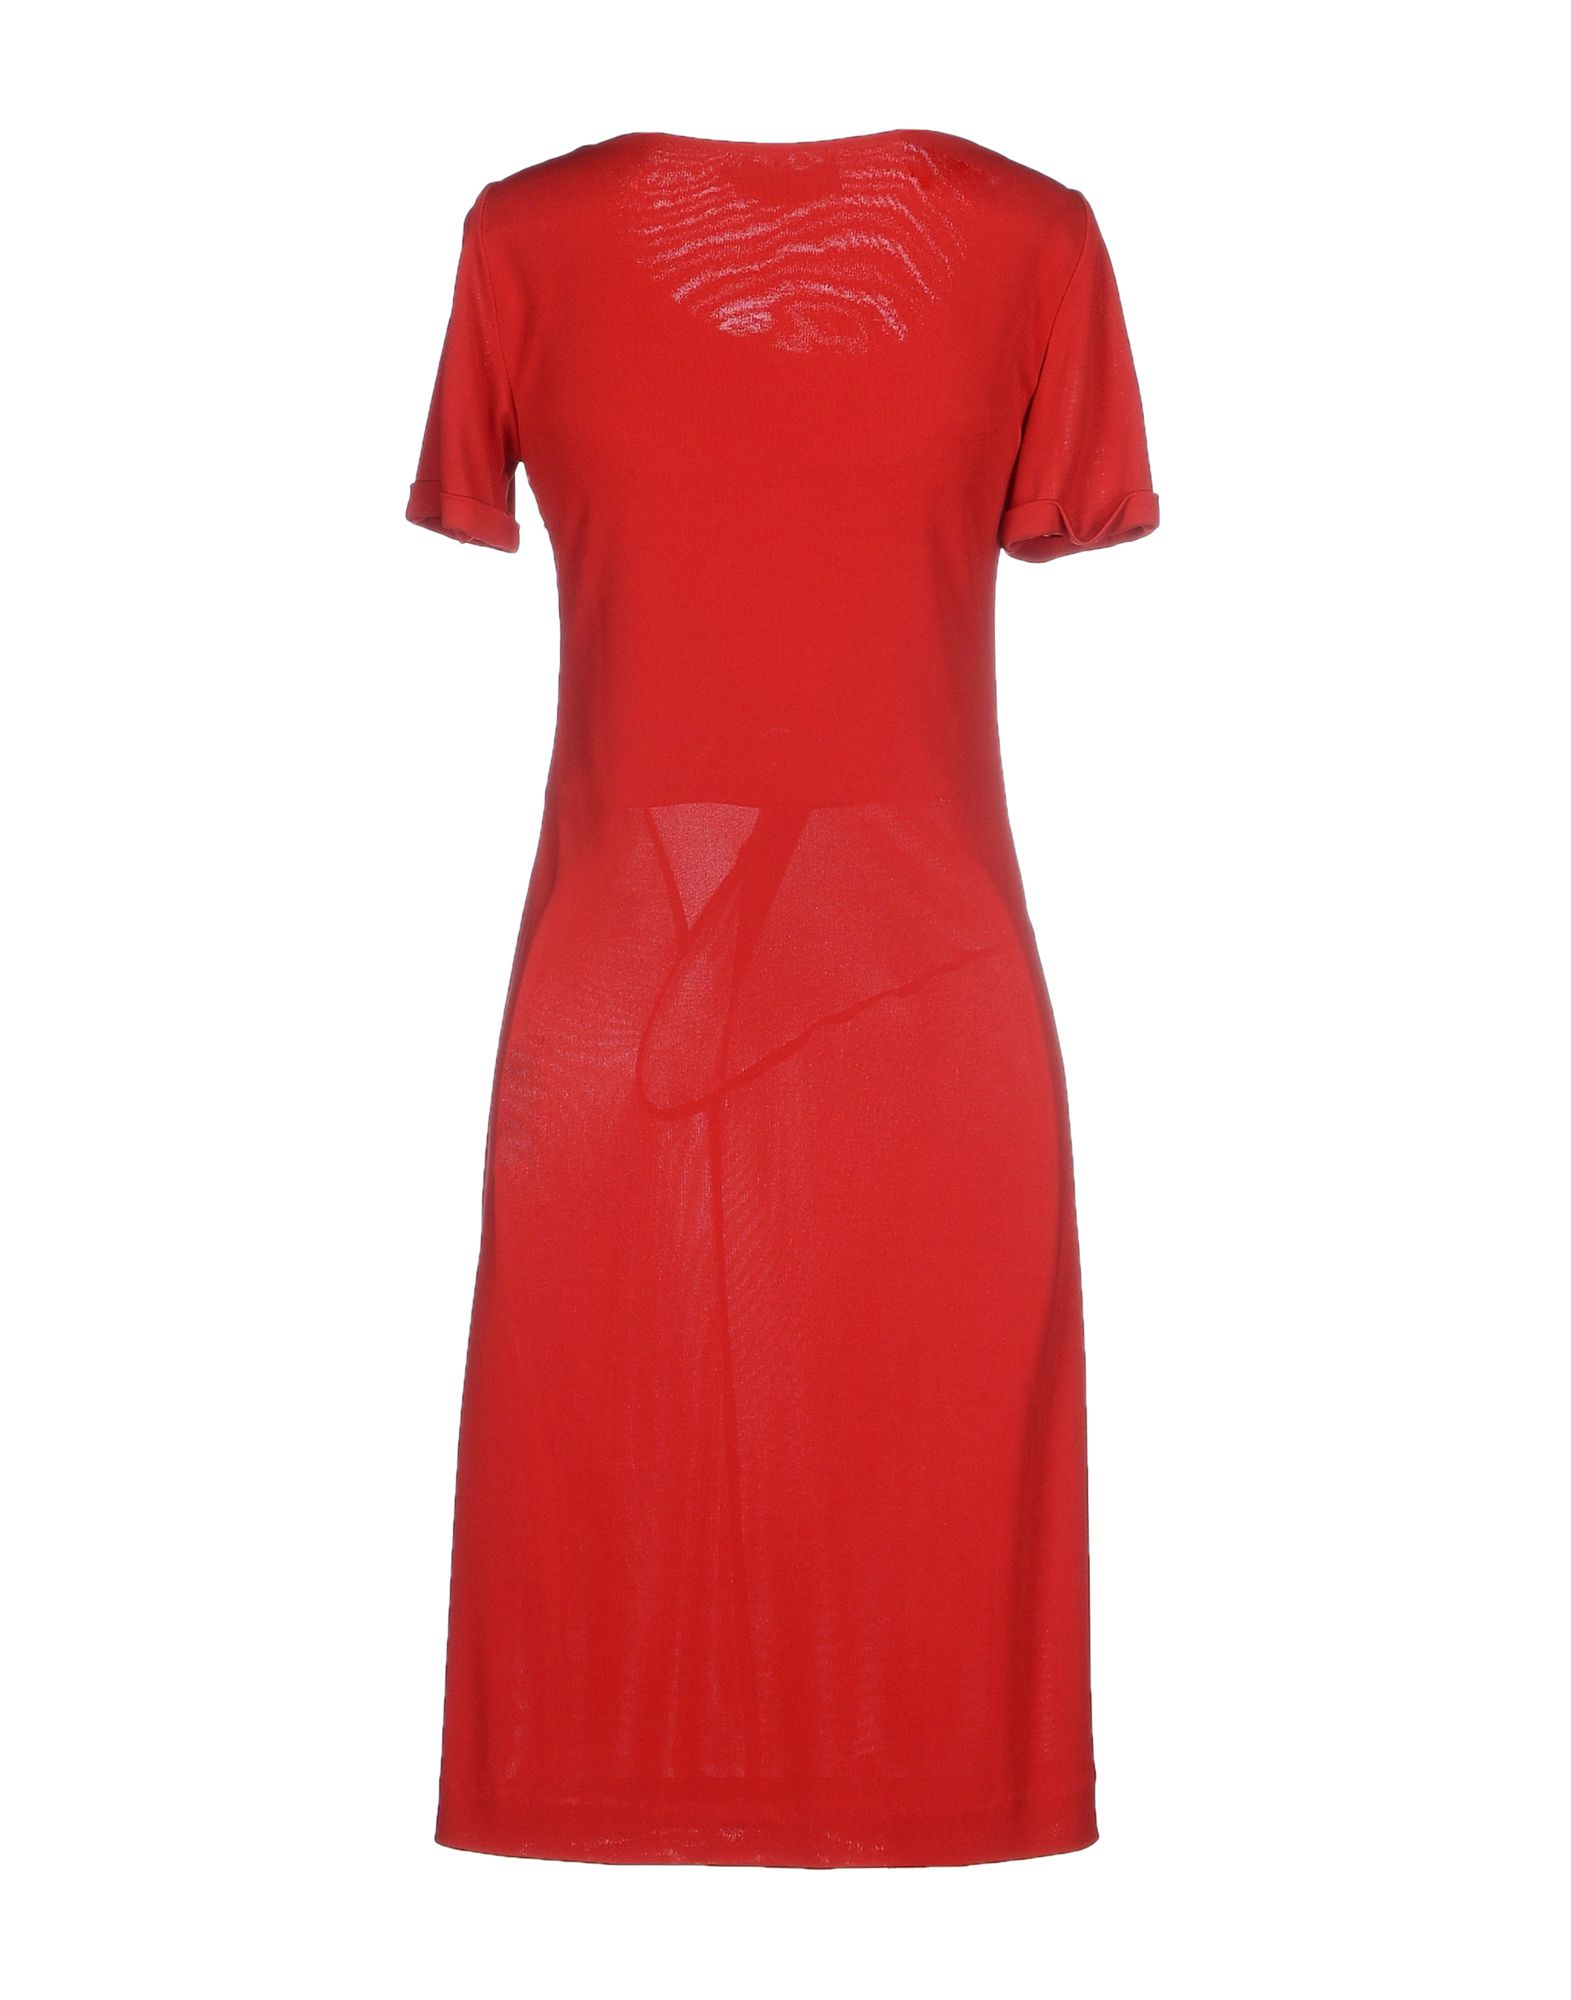 DRESSES - Knee-length dresses Hussein Chalayan 6ykNQc